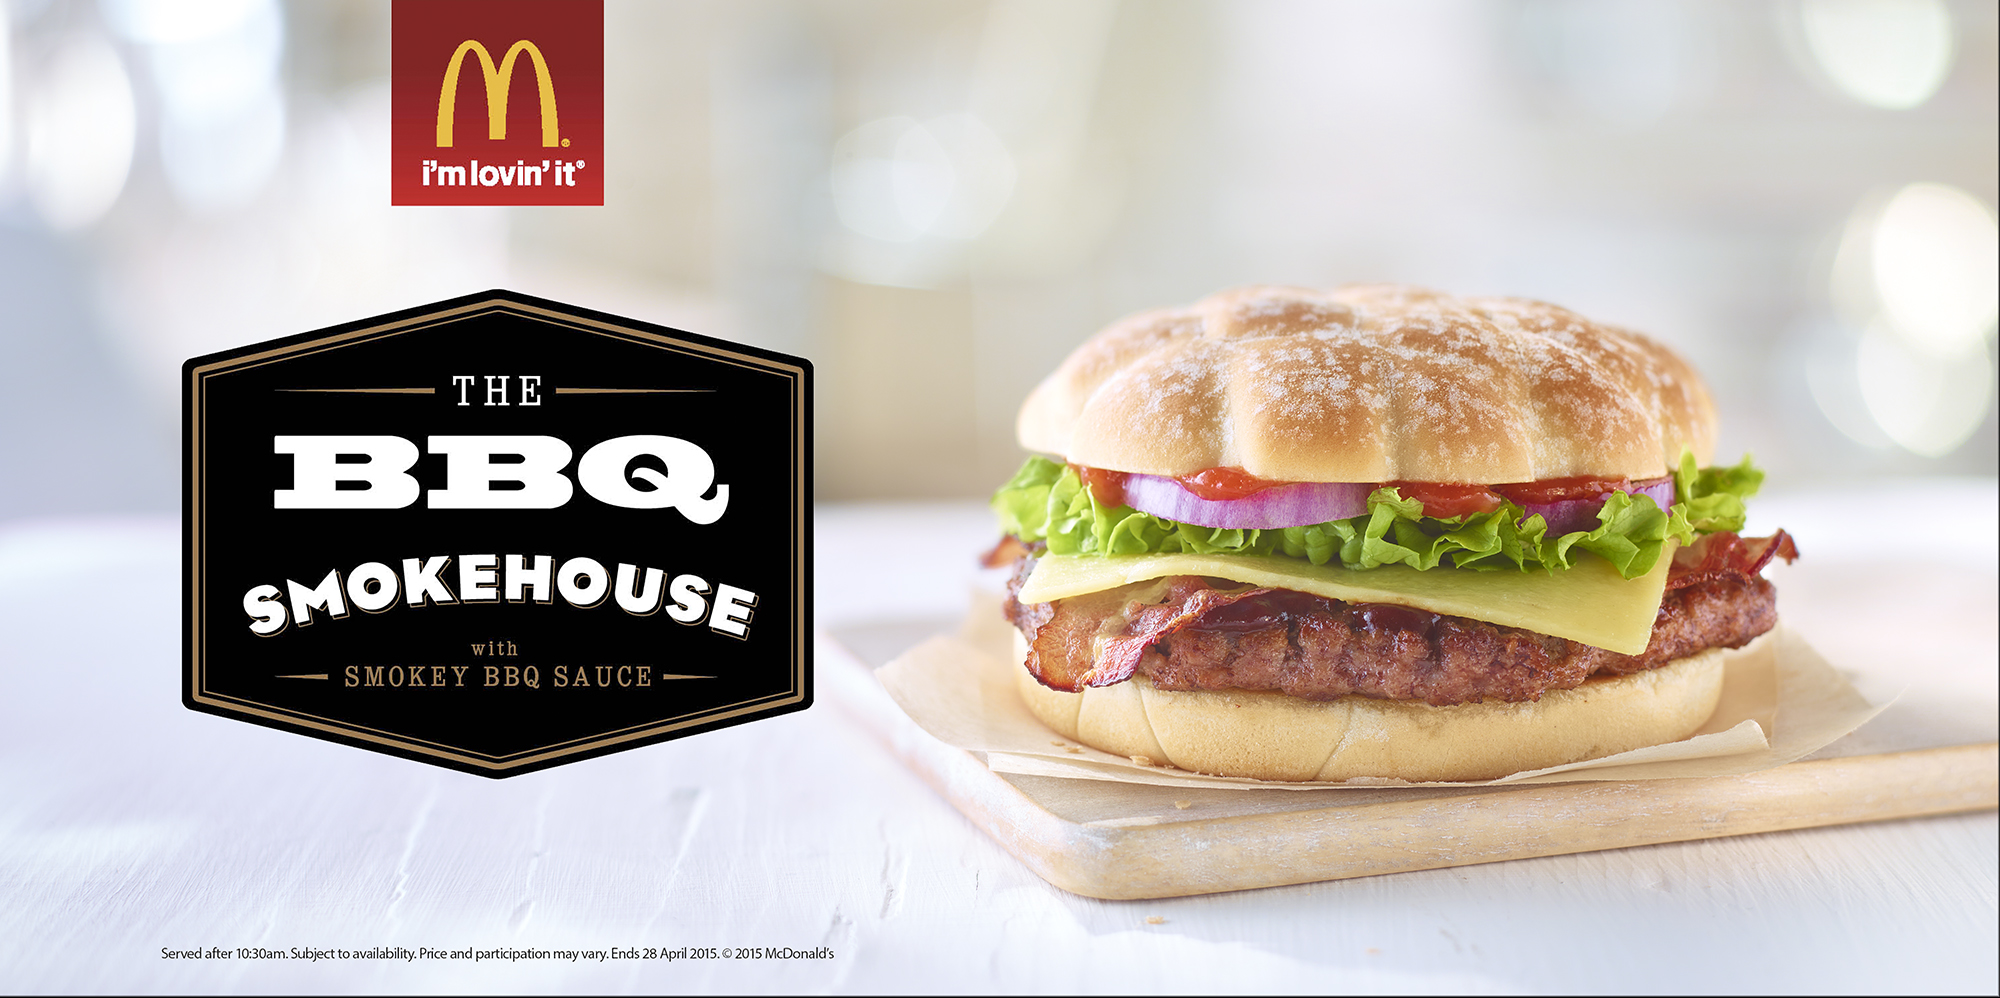 Myles_New_Food_Photographer_BBQ_STEAKHOUSE_ Burger_McDonalds_.jpg